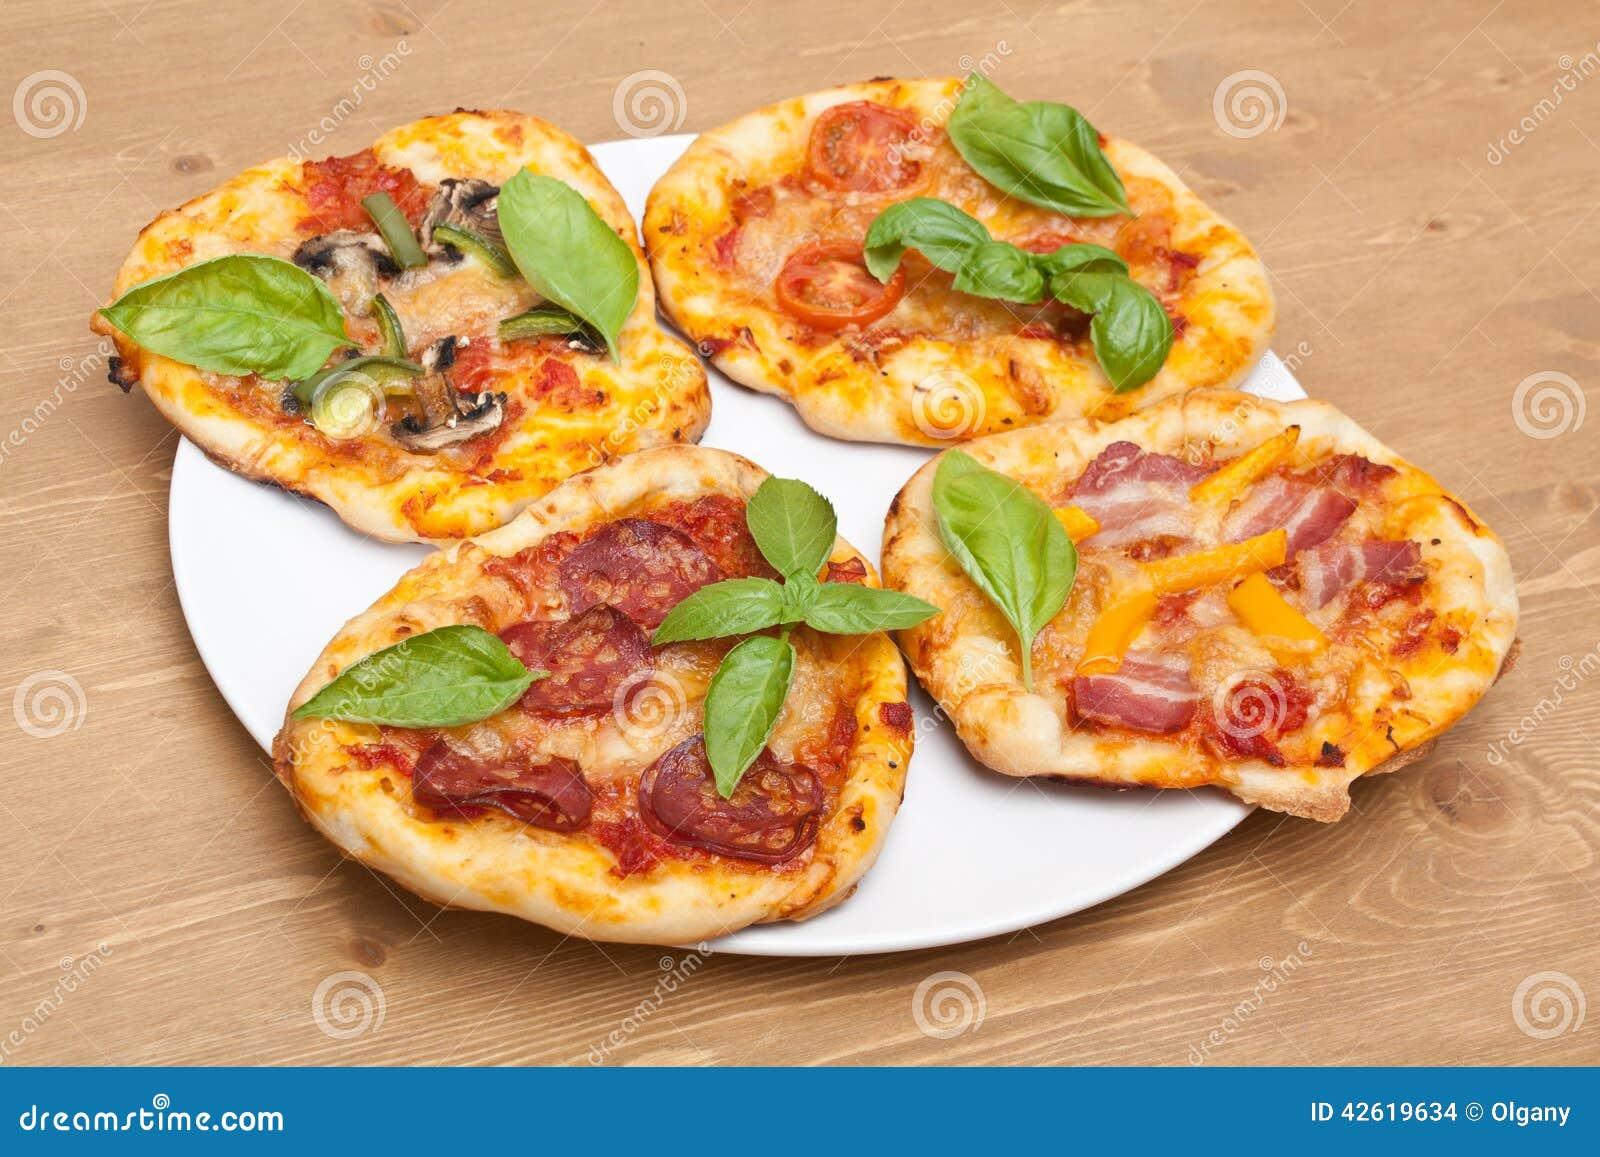 four mini pizzas stock photo image 42619634. Black Bedroom Furniture Sets. Home Design Ideas